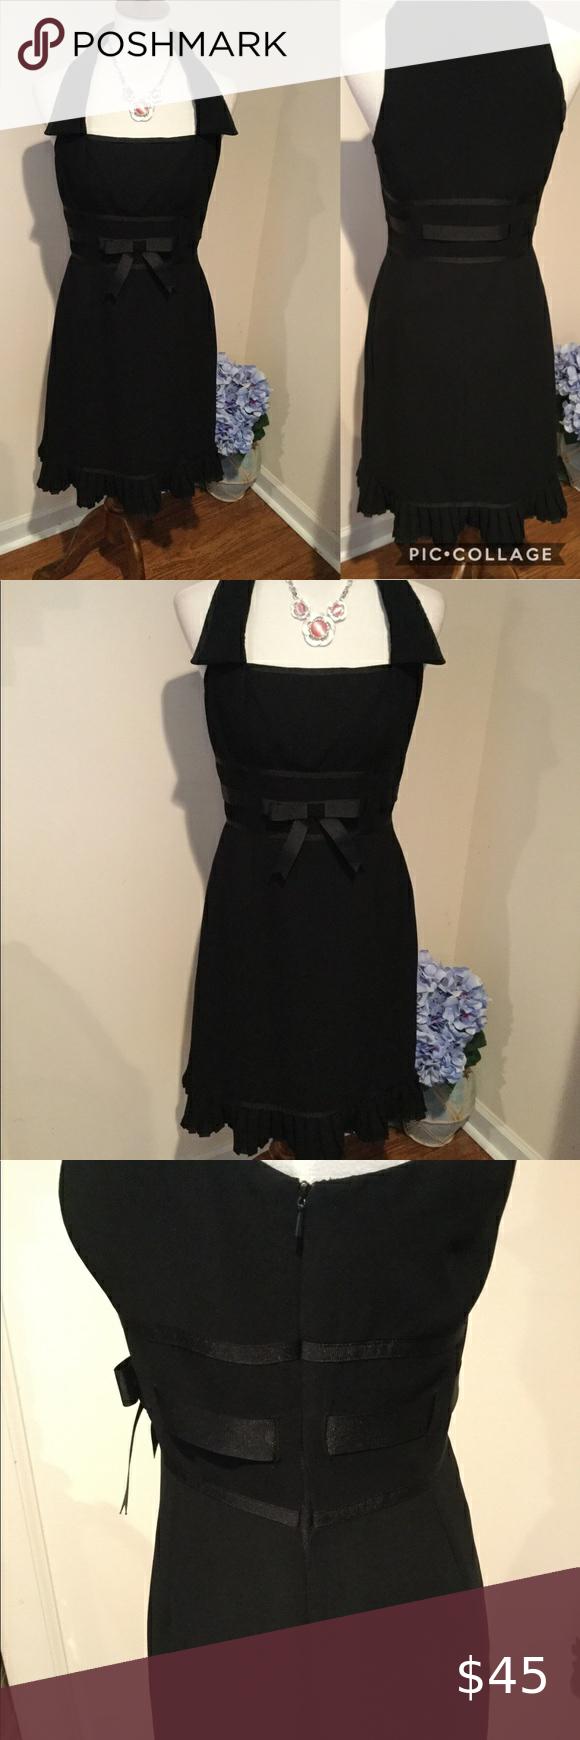 Cutest Little Black Dress Perfect Little Black Dress Little Black Dress Black Knit Dress